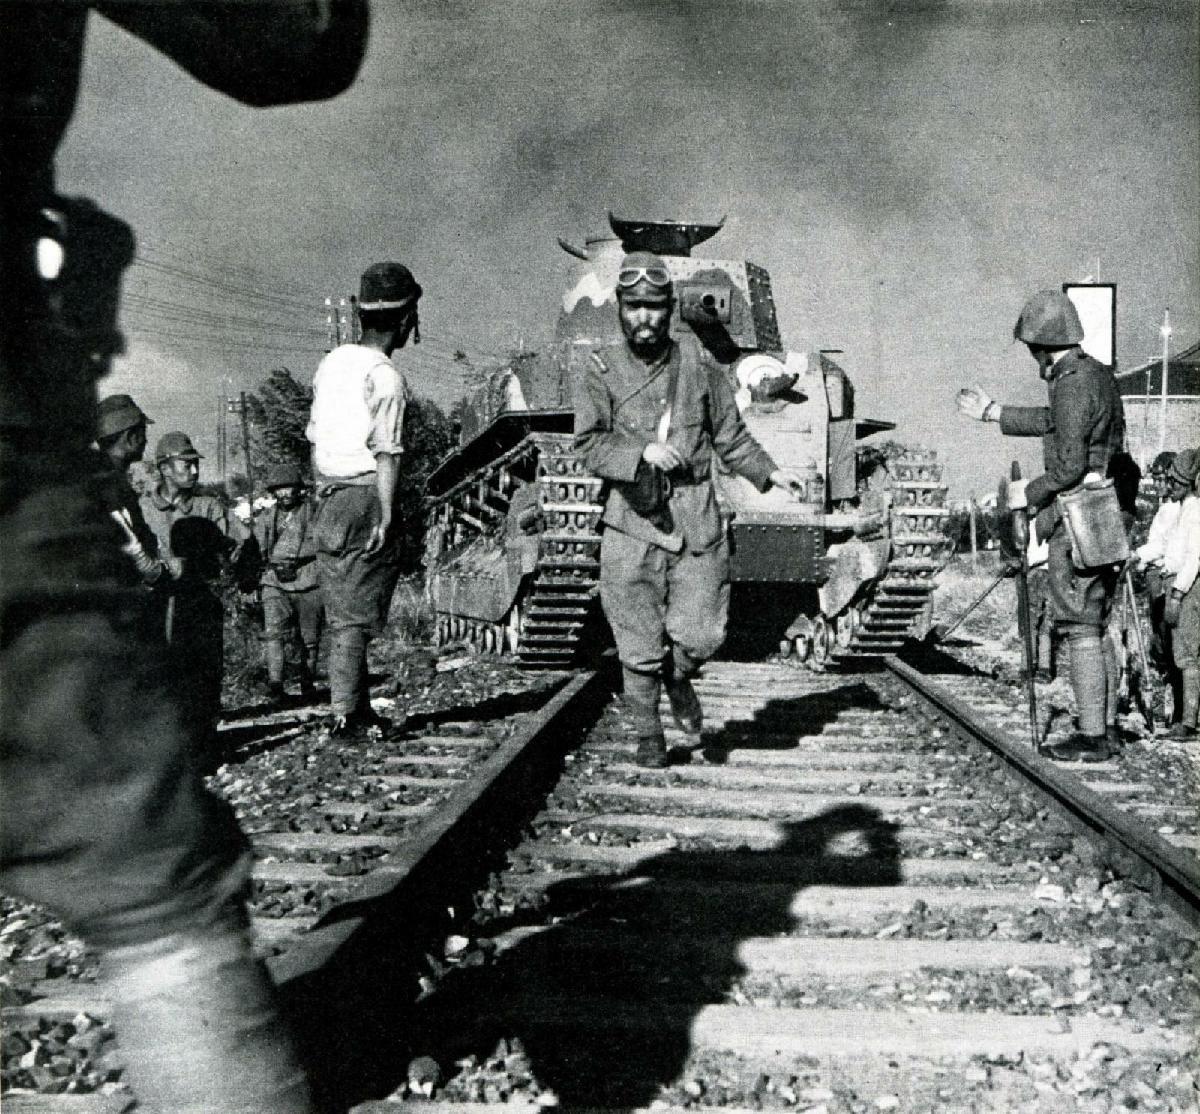 Japanese Type 89 I-Go medium tank on the Shanghai-Nanking railroad in China, circa late 1937